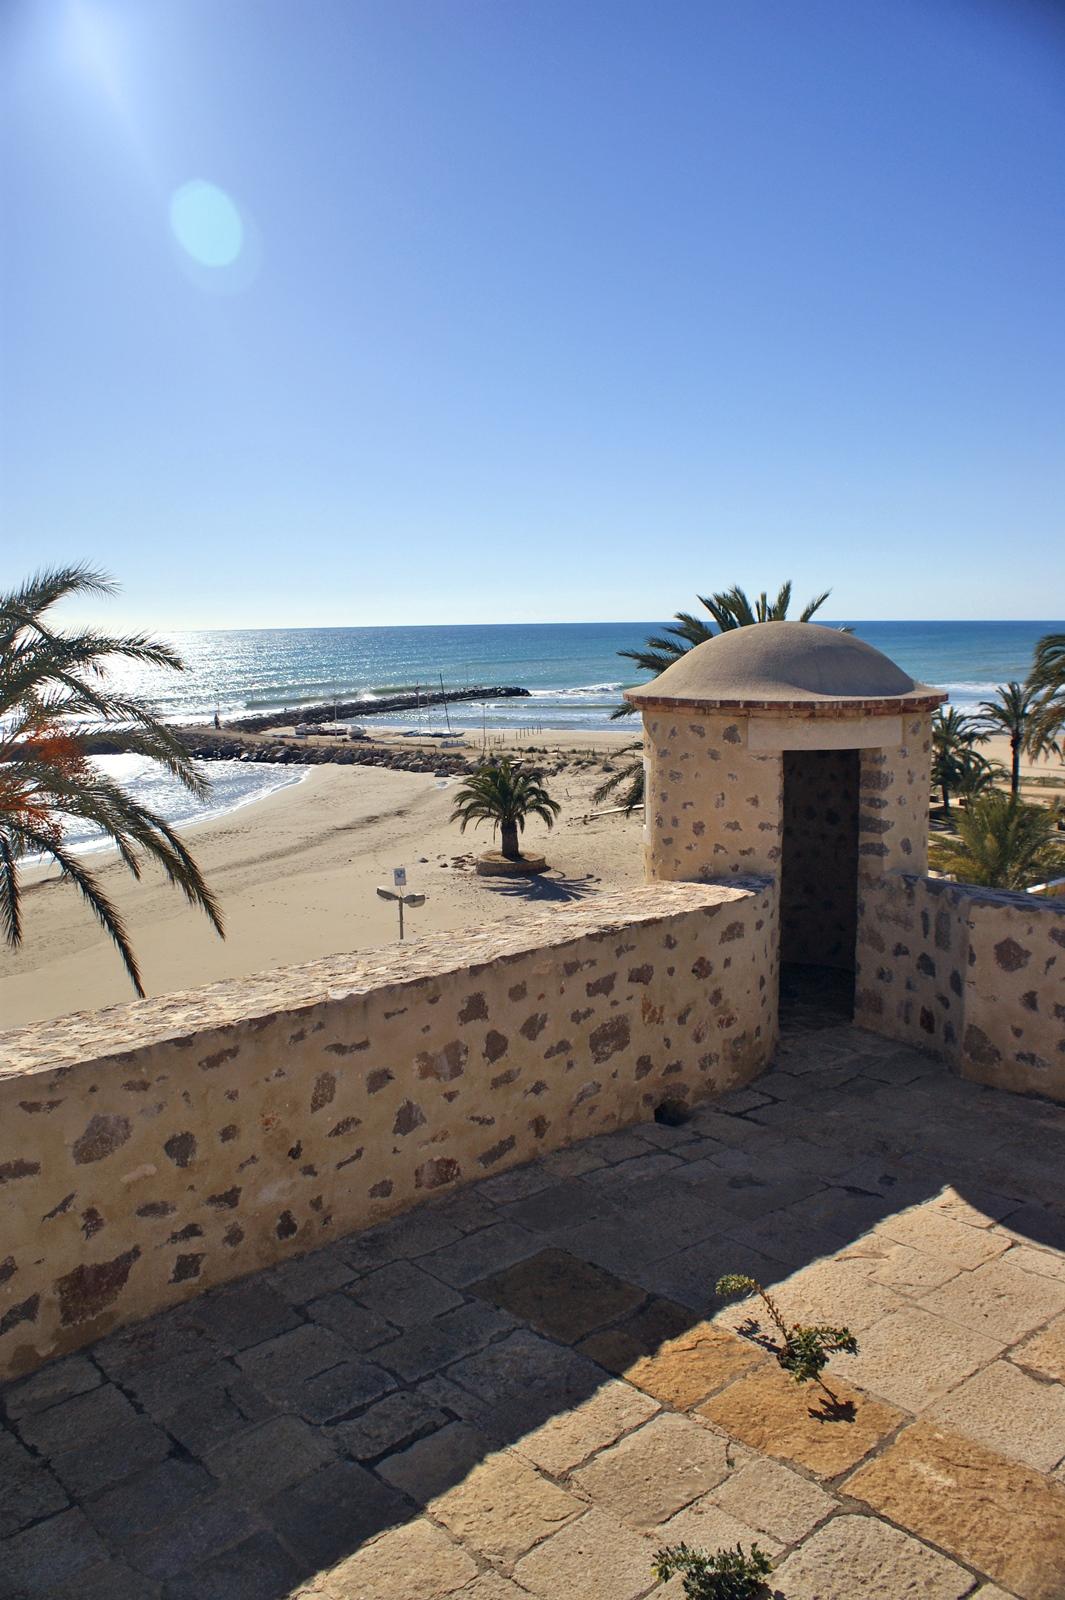 En Torrenostra. Autor, Patronato provincial de turismo de Castellón